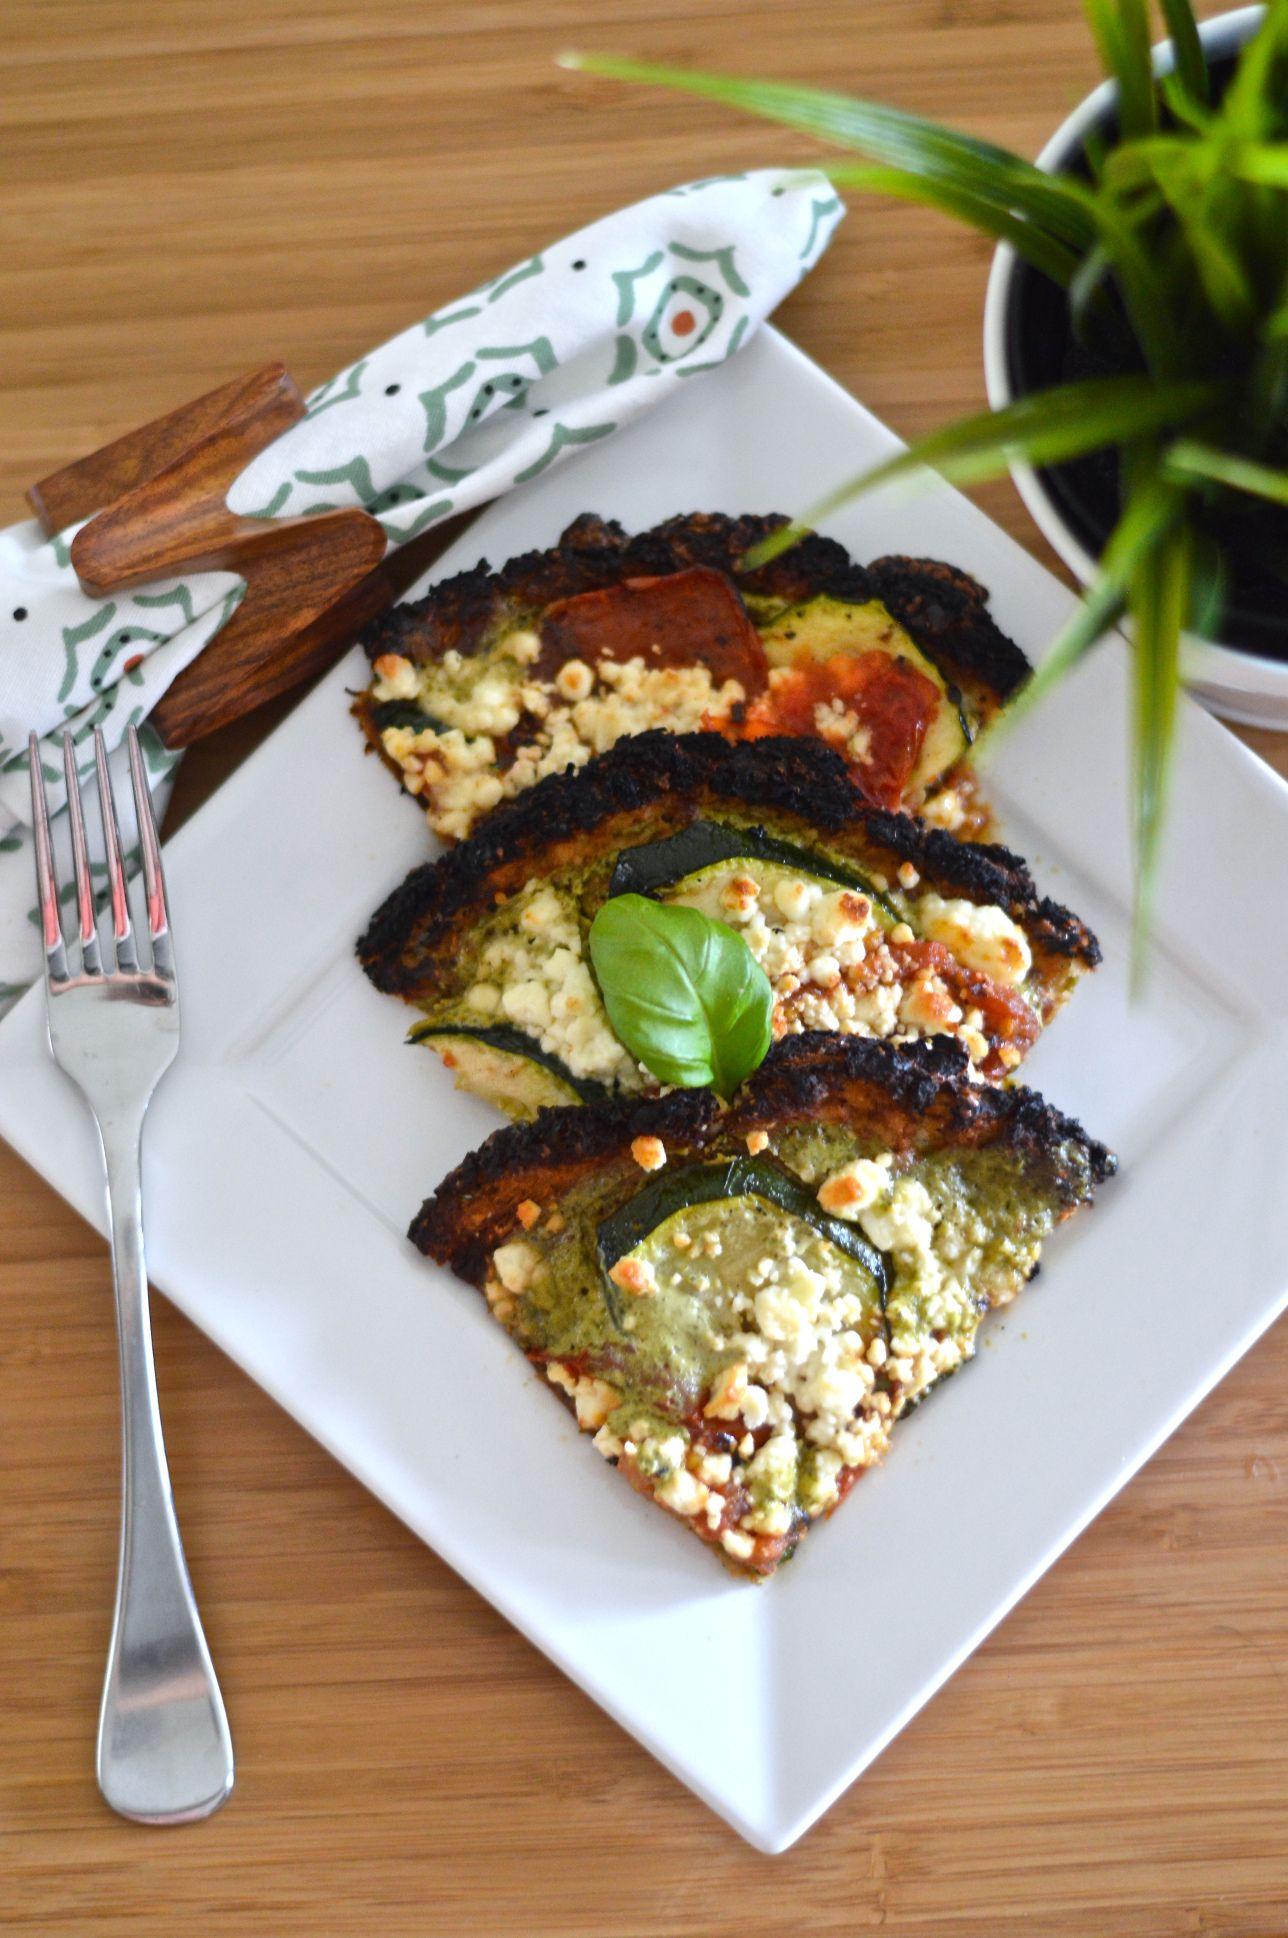 Cauliflower pizza with greek yogurt pesto. 230 kcal. Month 5 - week 4.